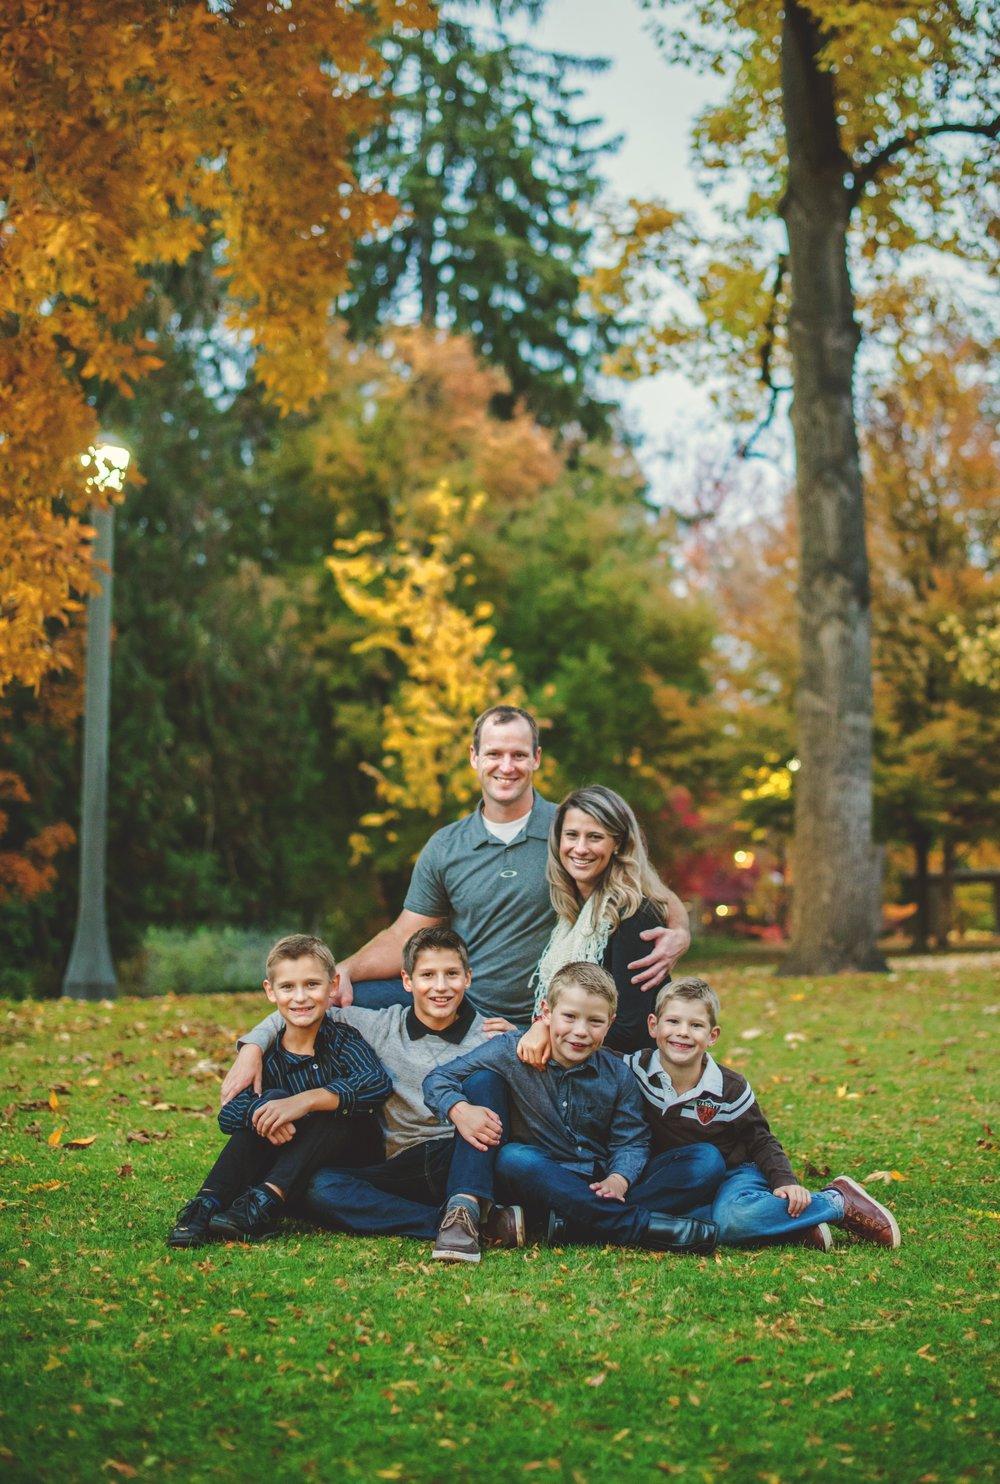 FamilyPhotos2018-17a.jpg